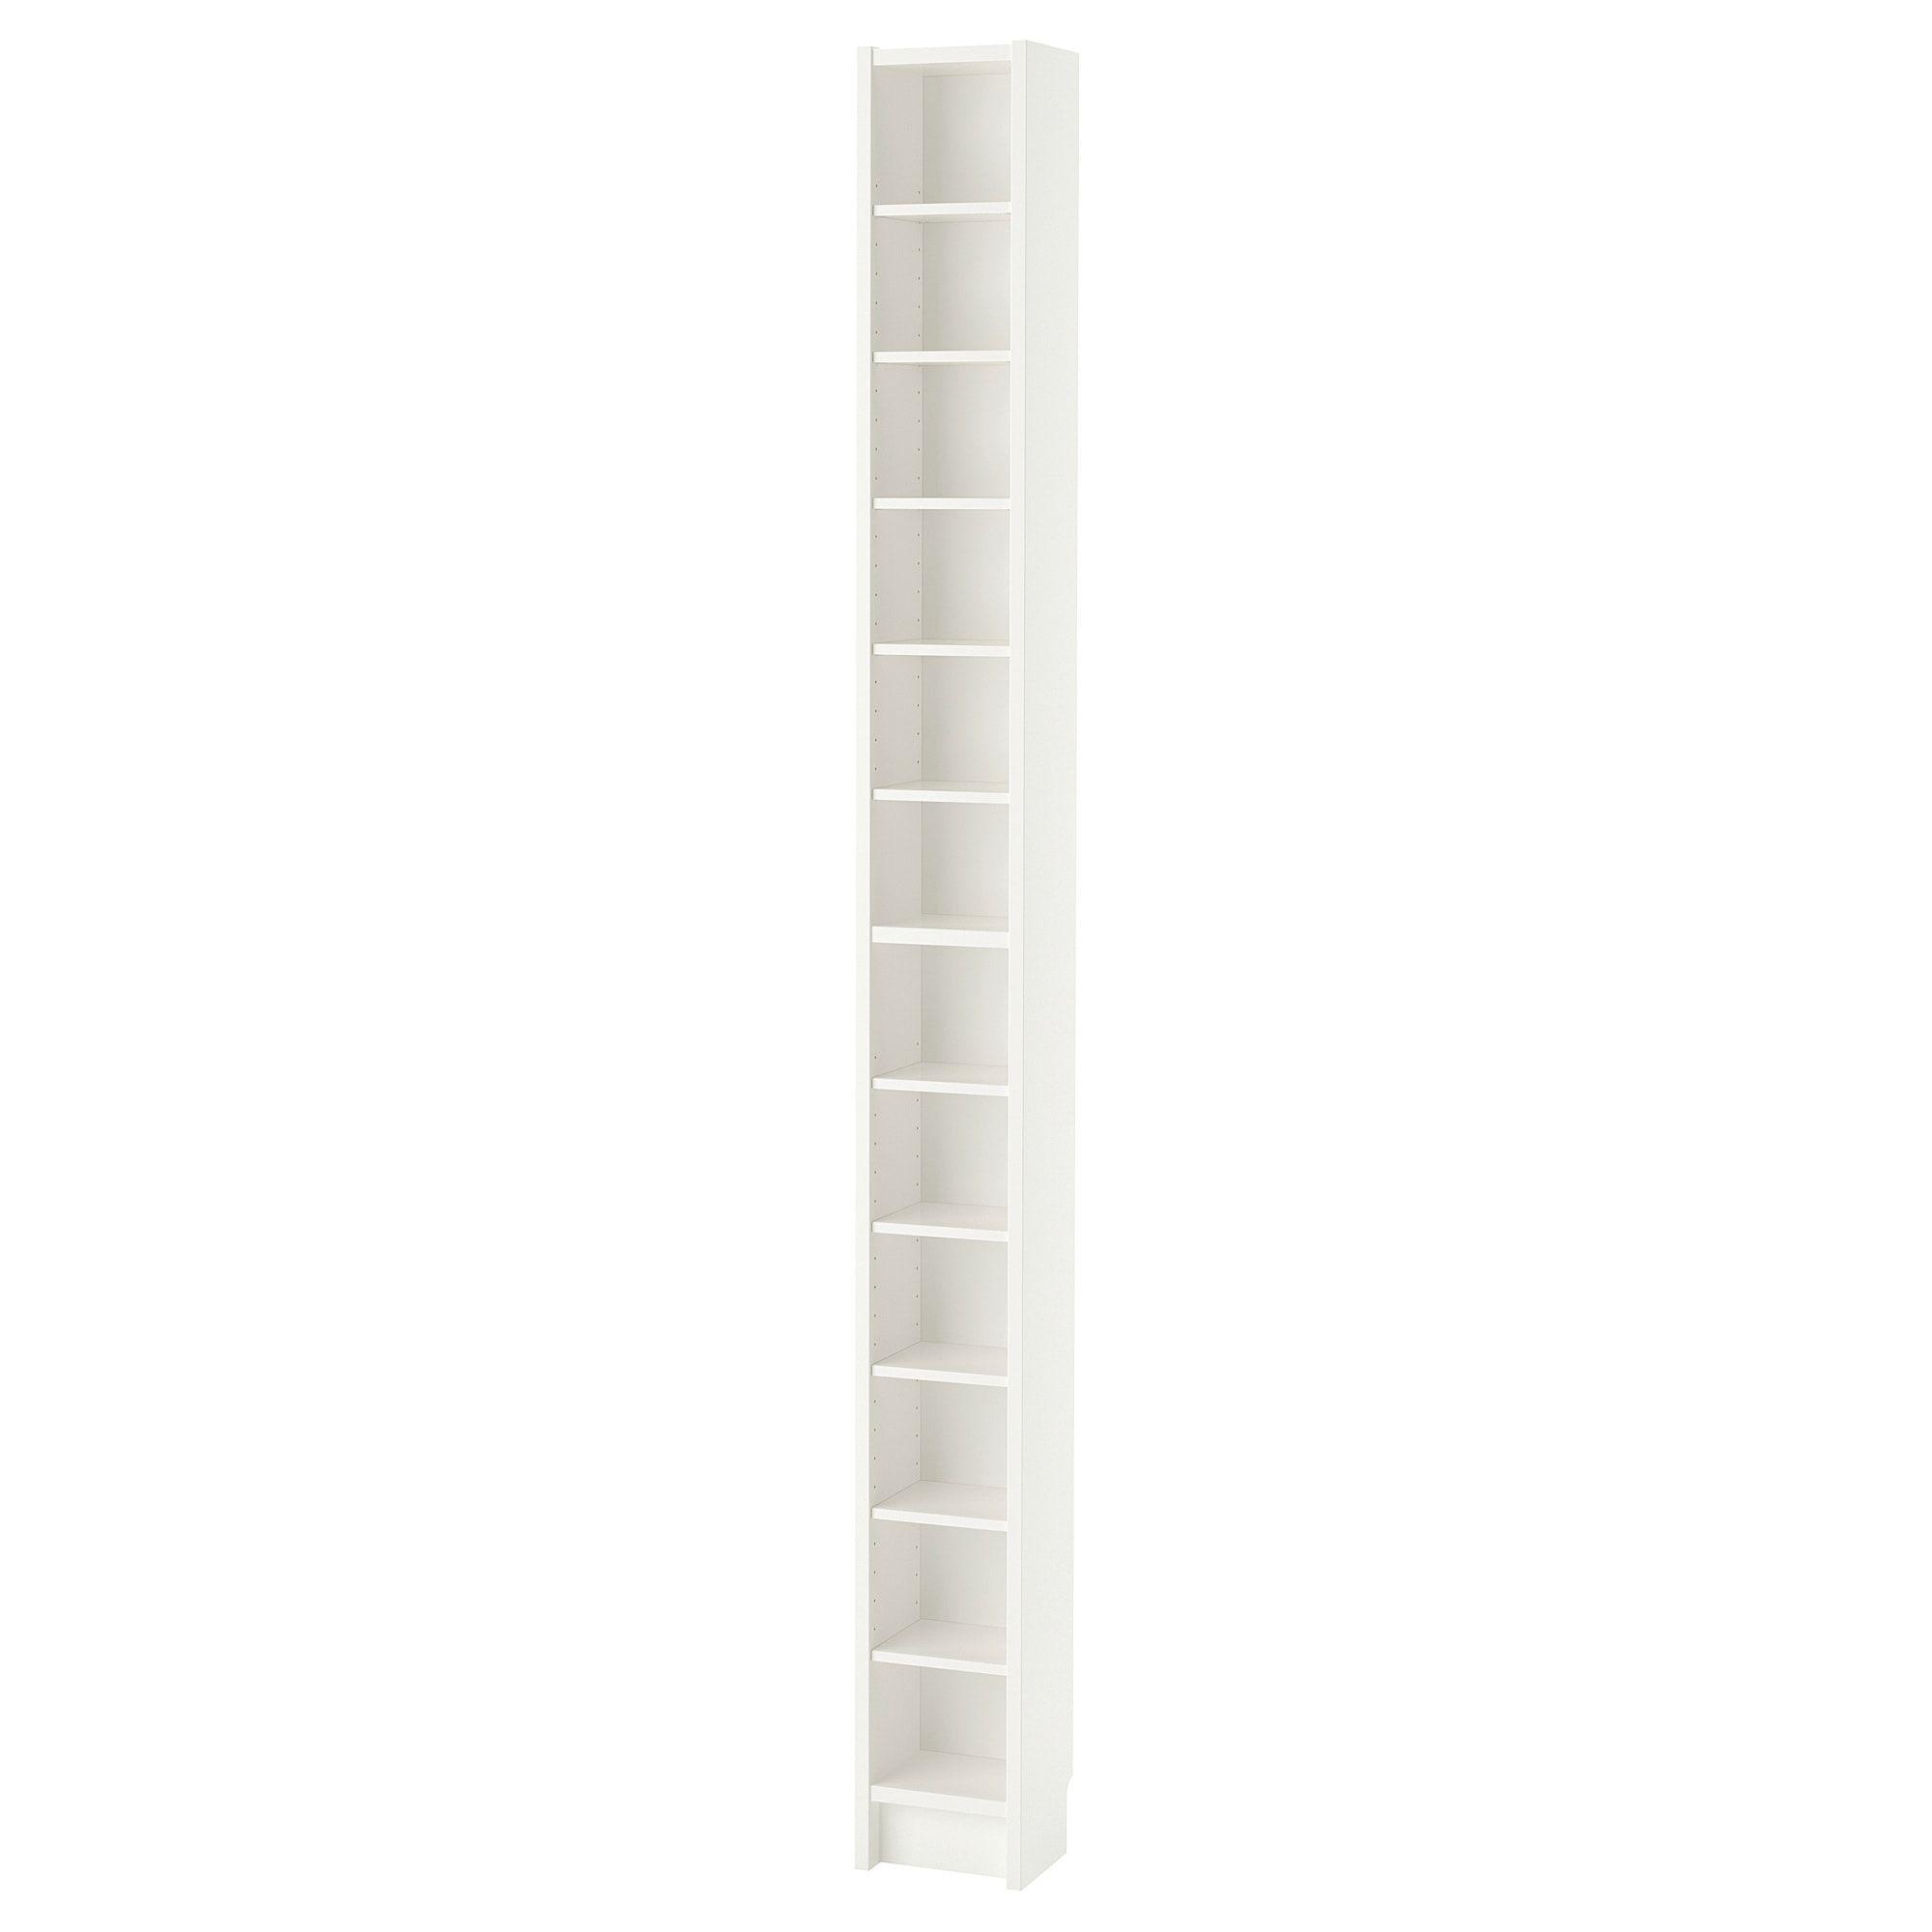 Ikea Us Furniture And Home Furnishings Wall Shelf Unit Billy Bookcase Shelving Unit